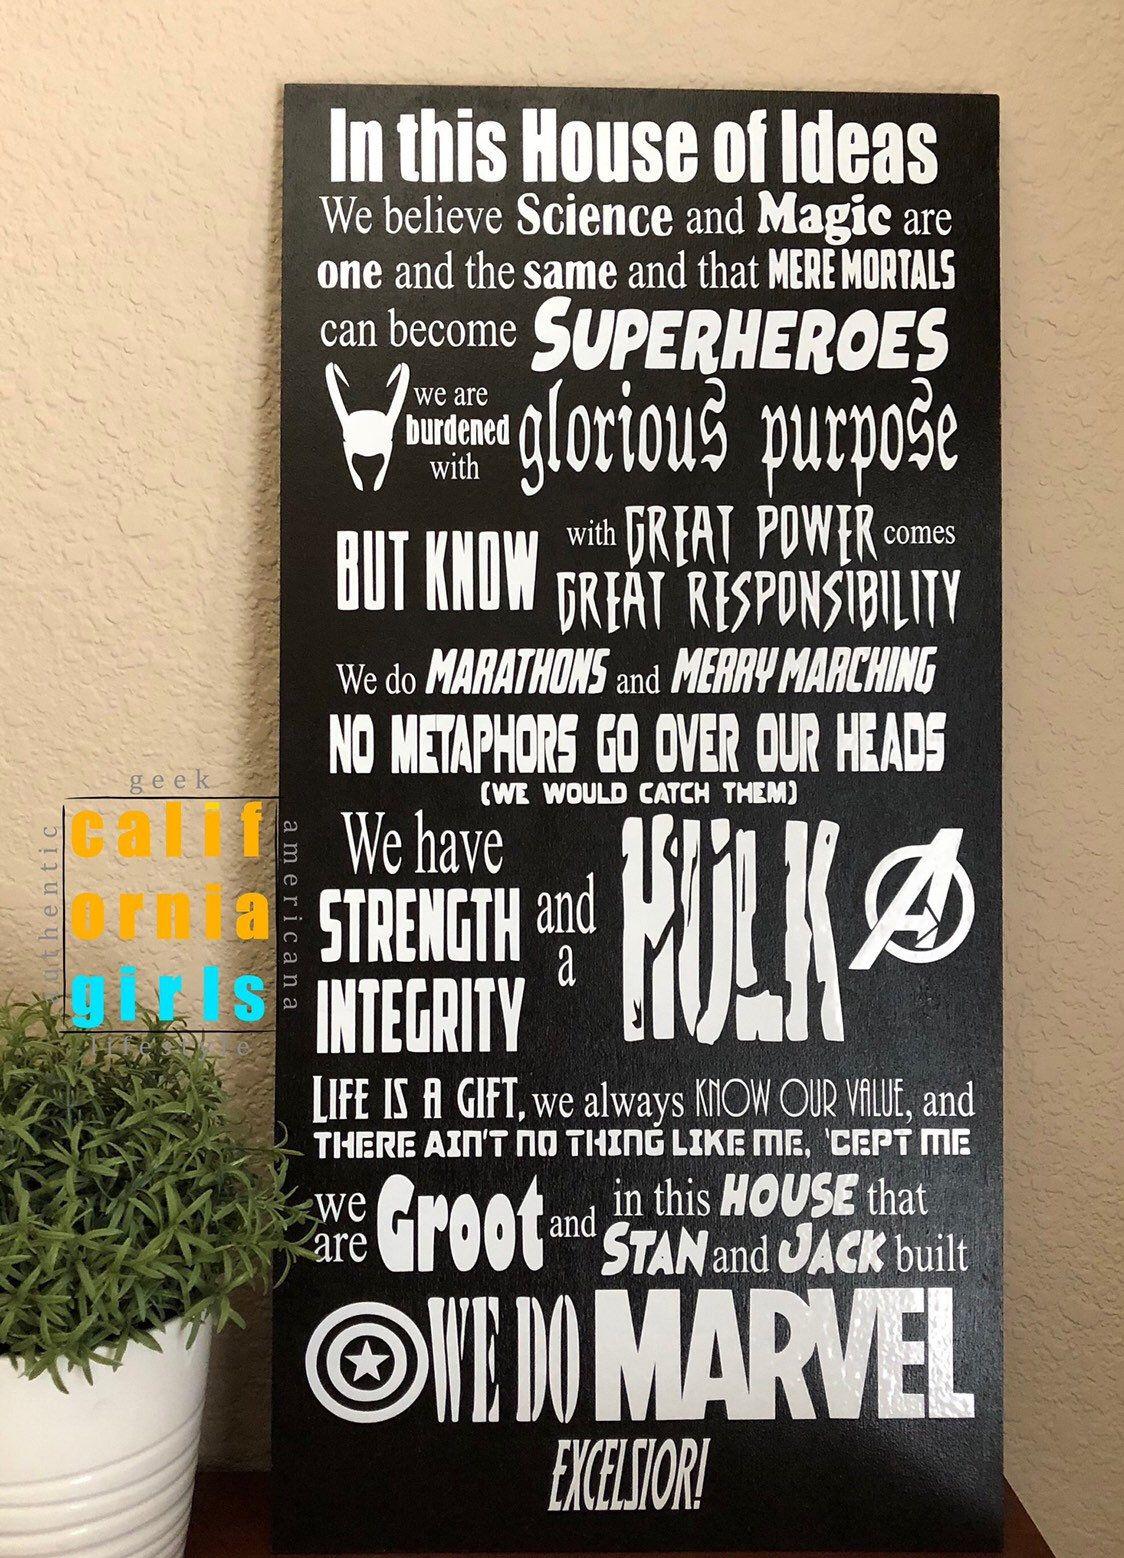 Pin on Disney quotes